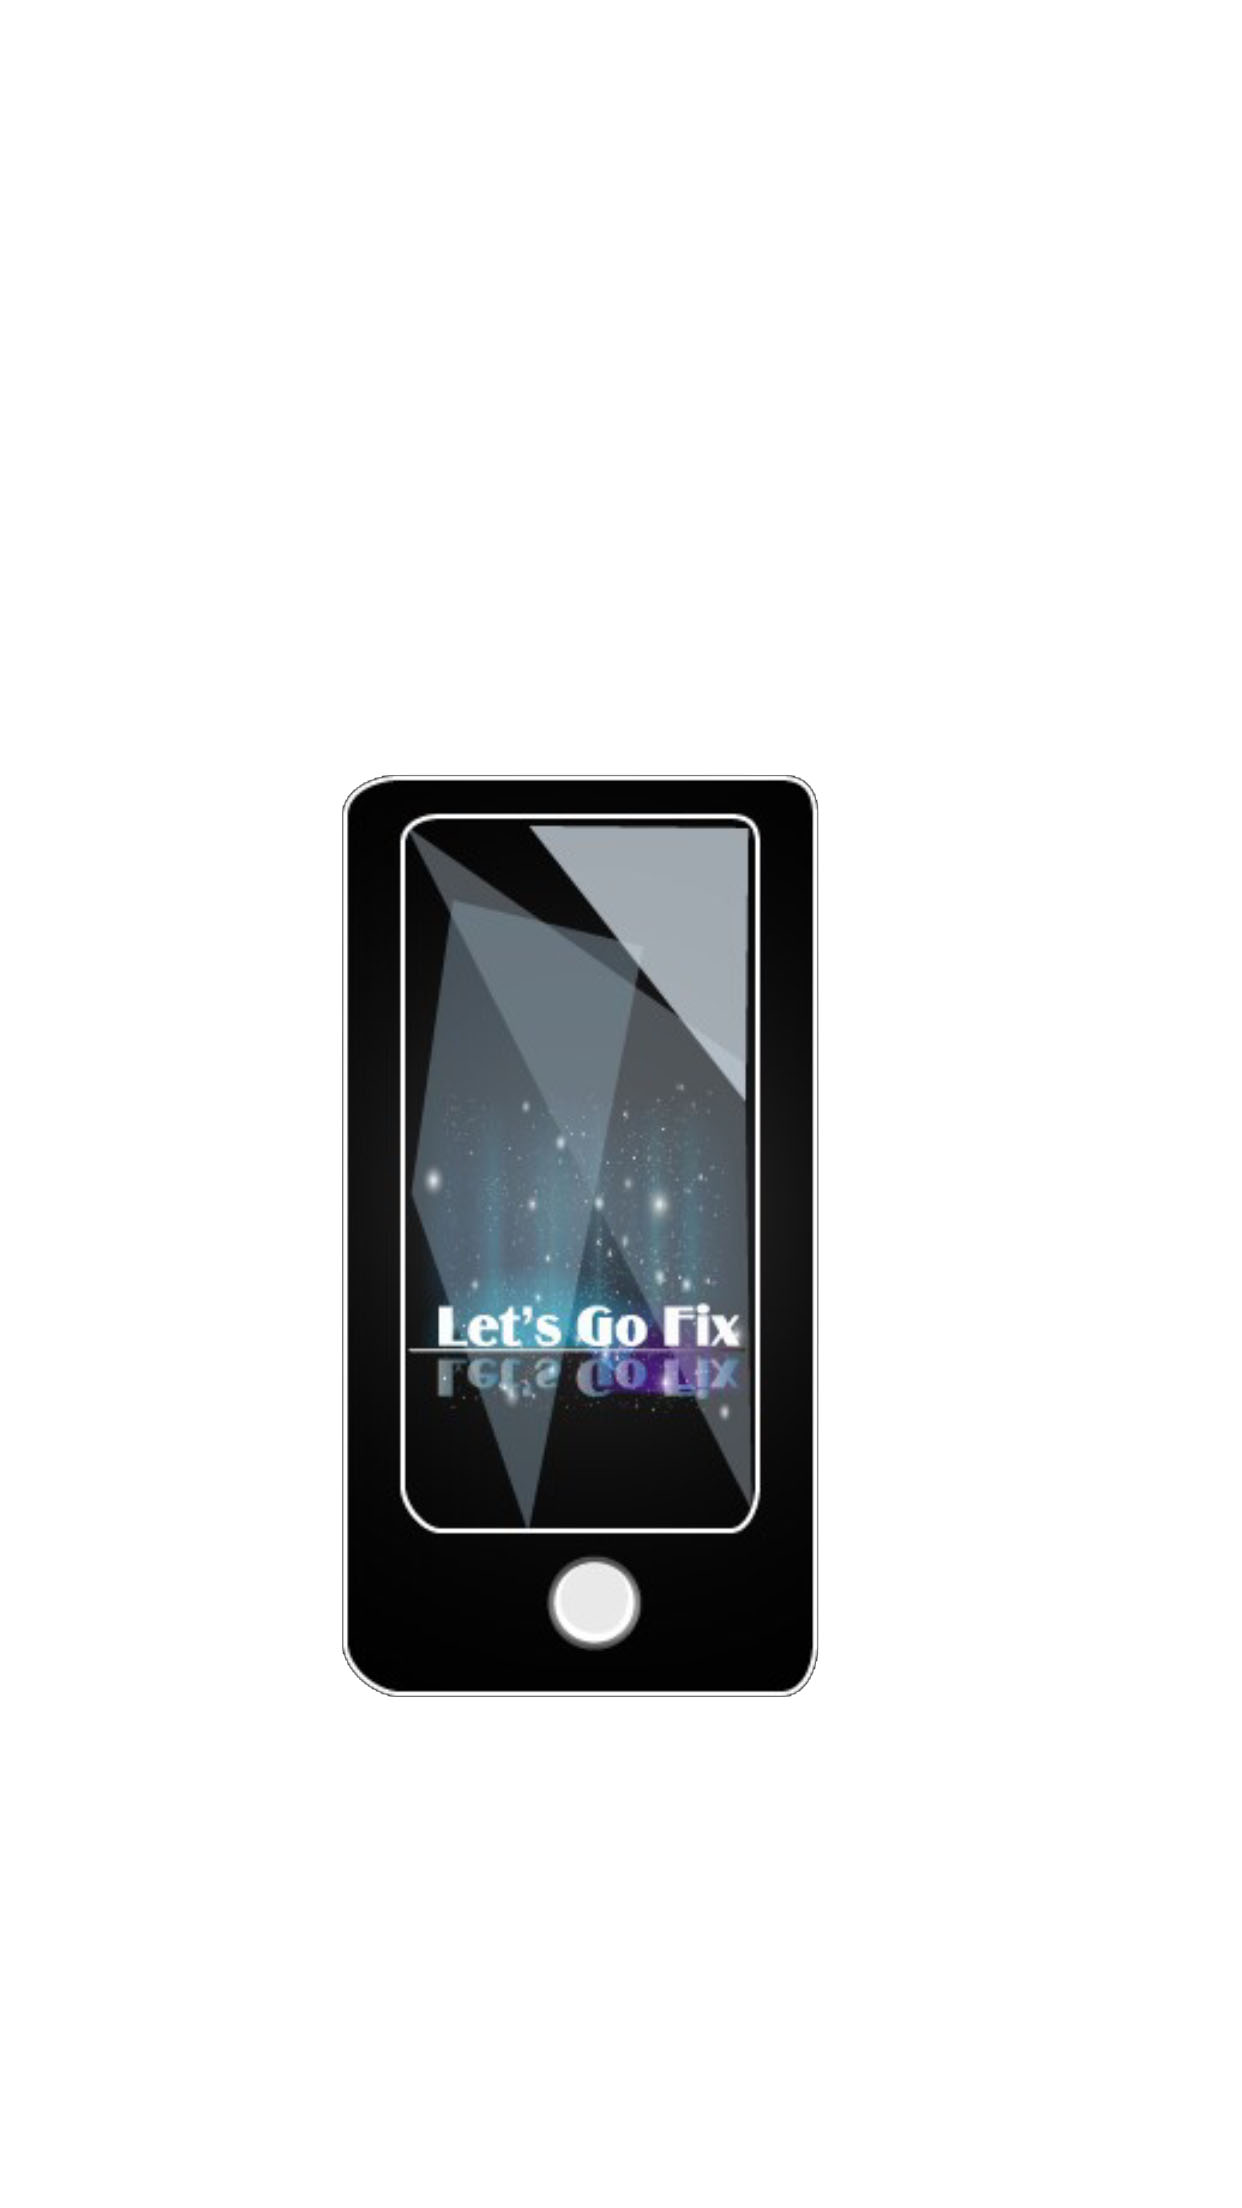 Let's Go Fix - iPhone Repair Service in Hong